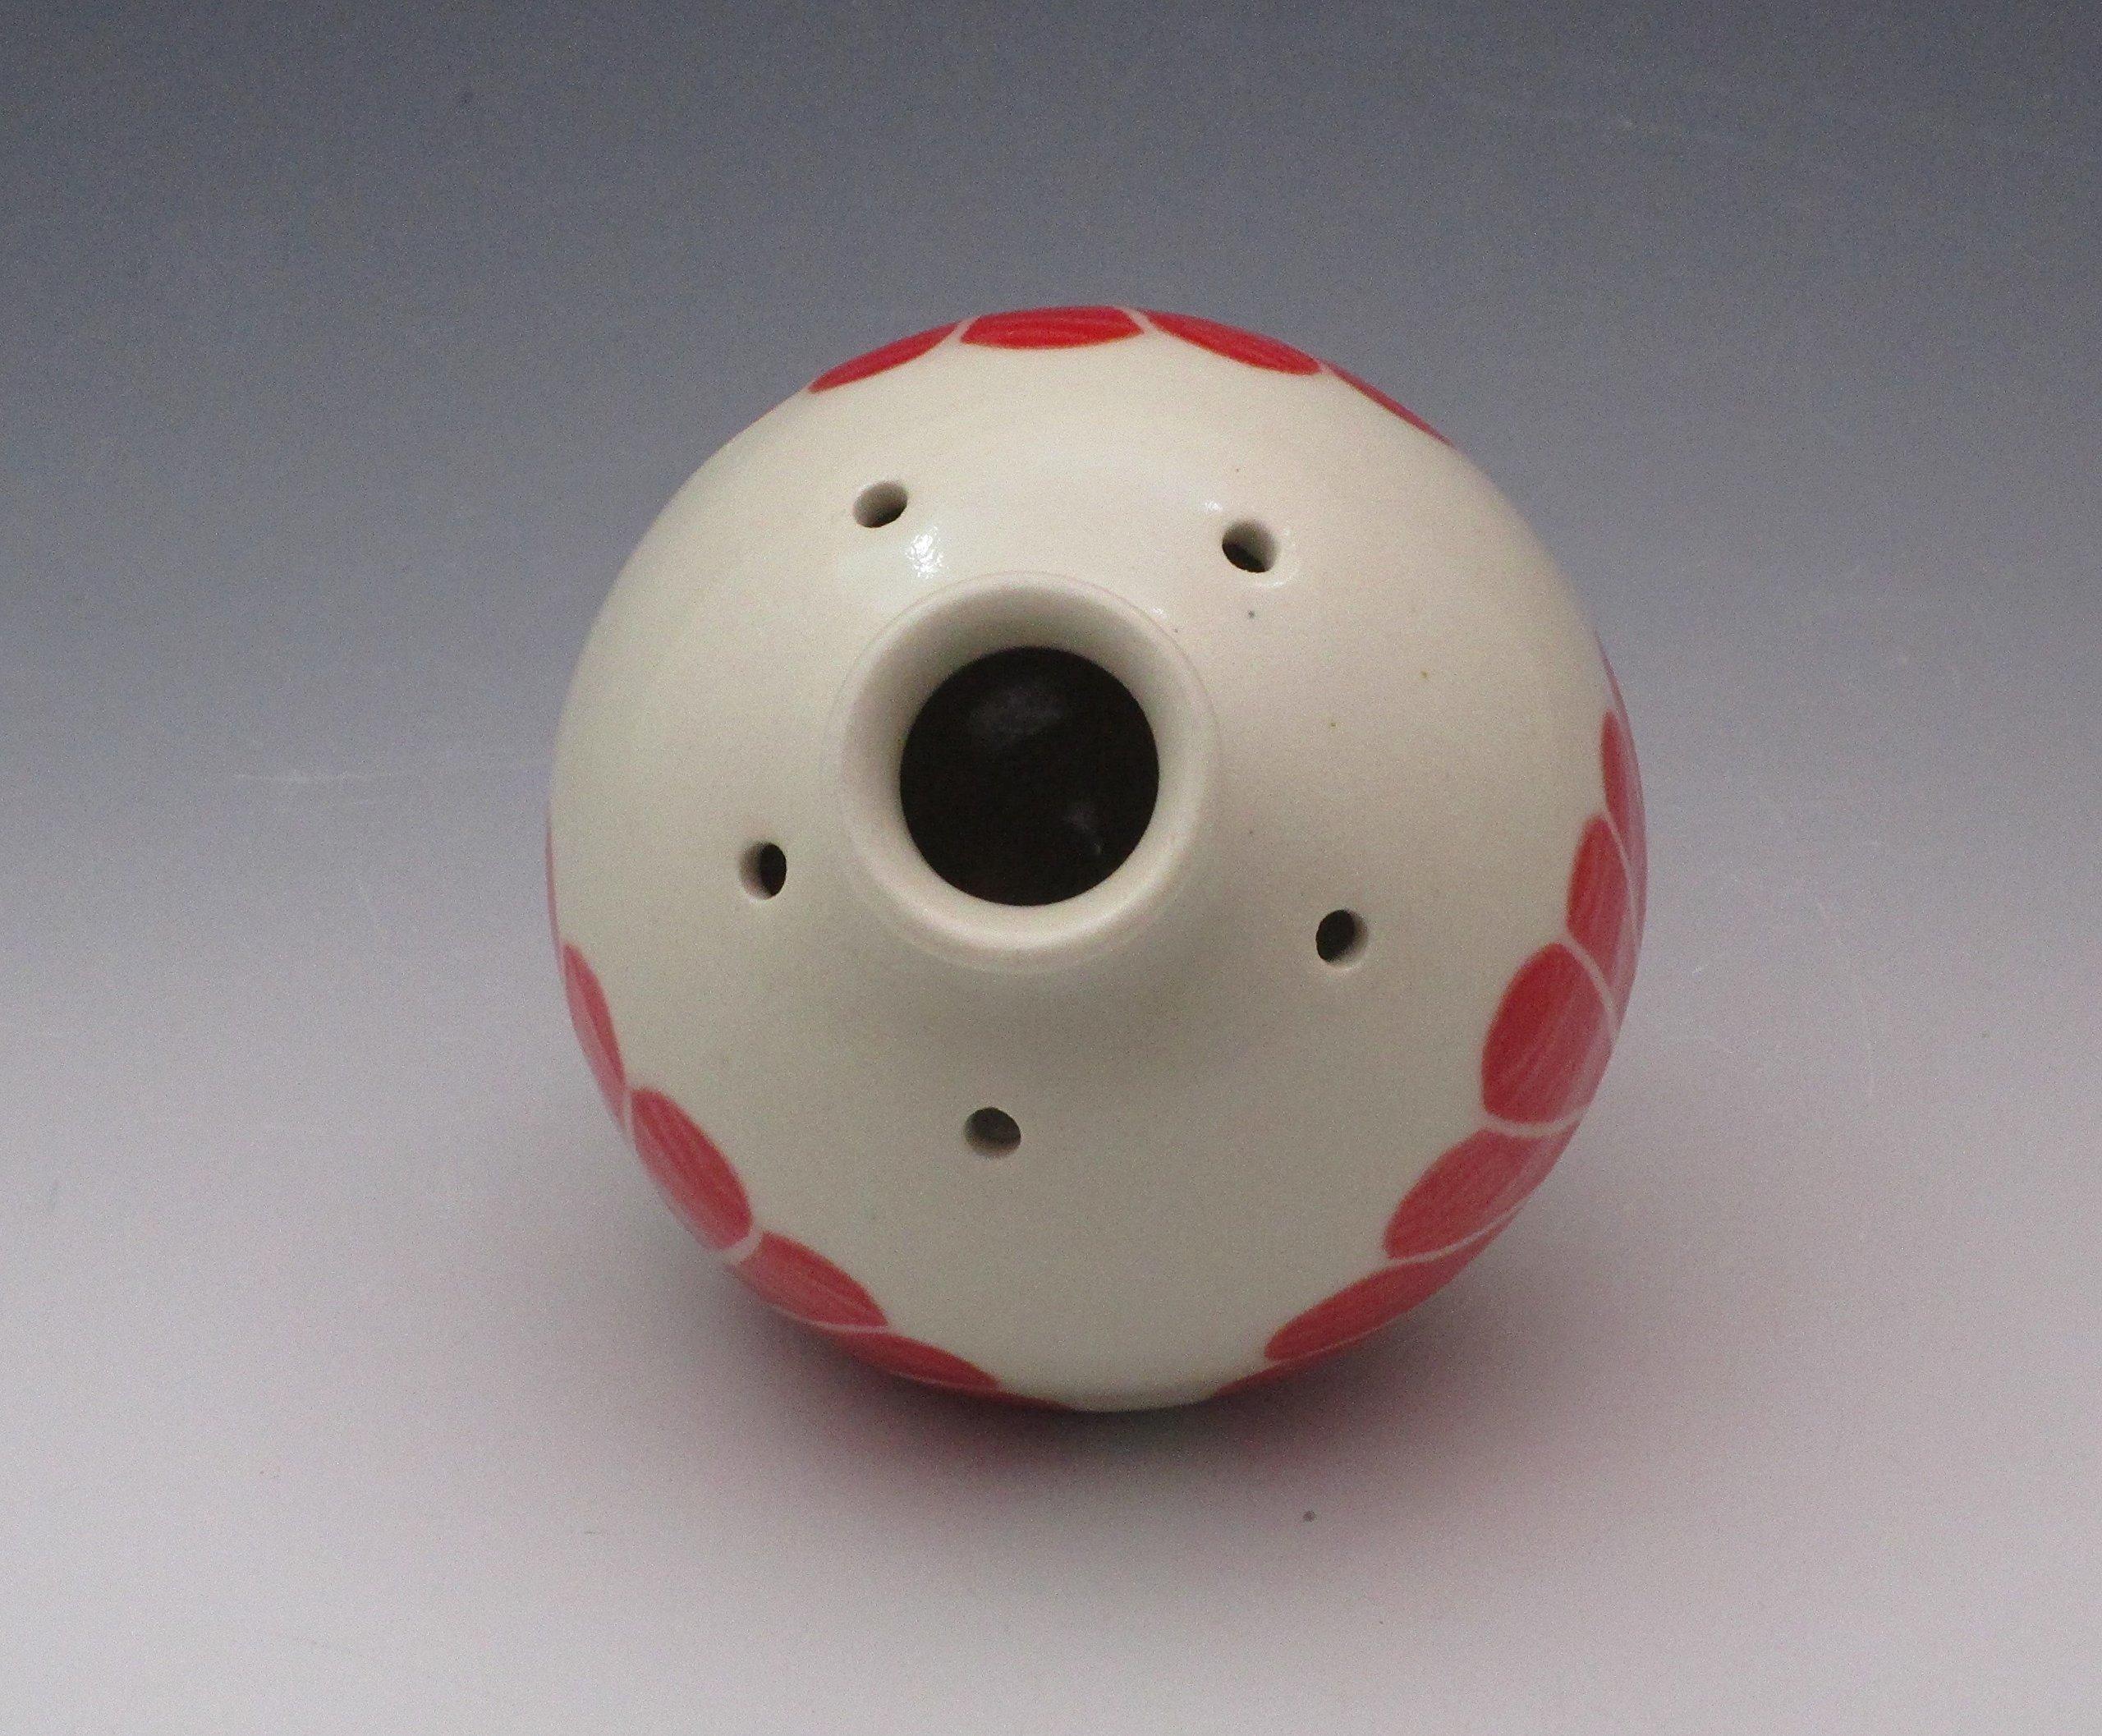 Porcelain Bud Vase, Essential Oil Reed Diffuser, Handpained in Red Flower design